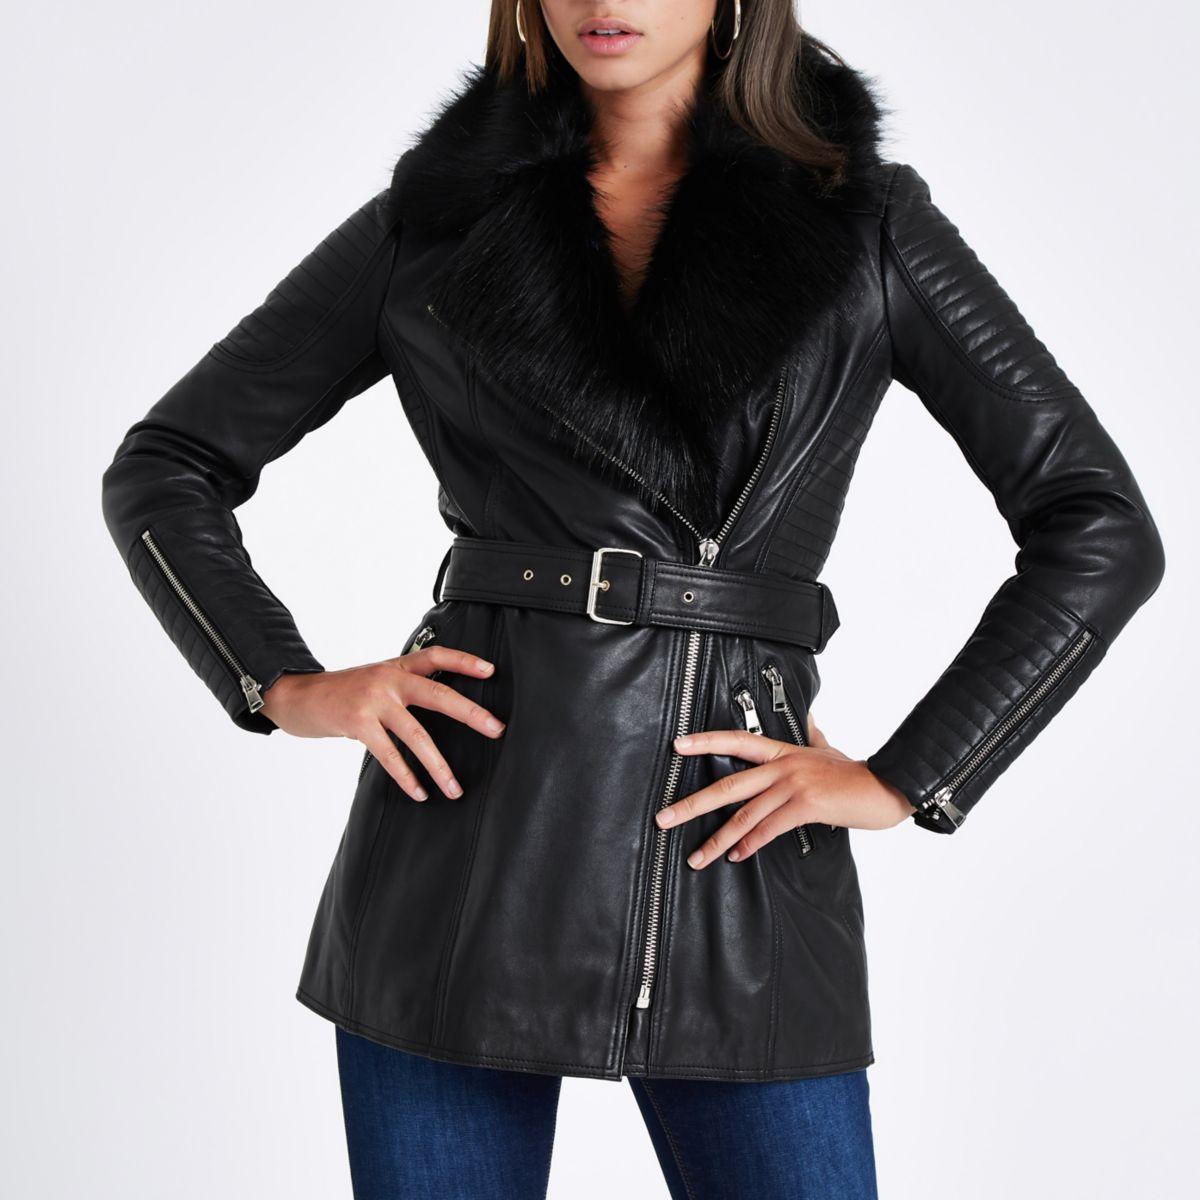 Black faux fur trim leather belted coat Winter jackets